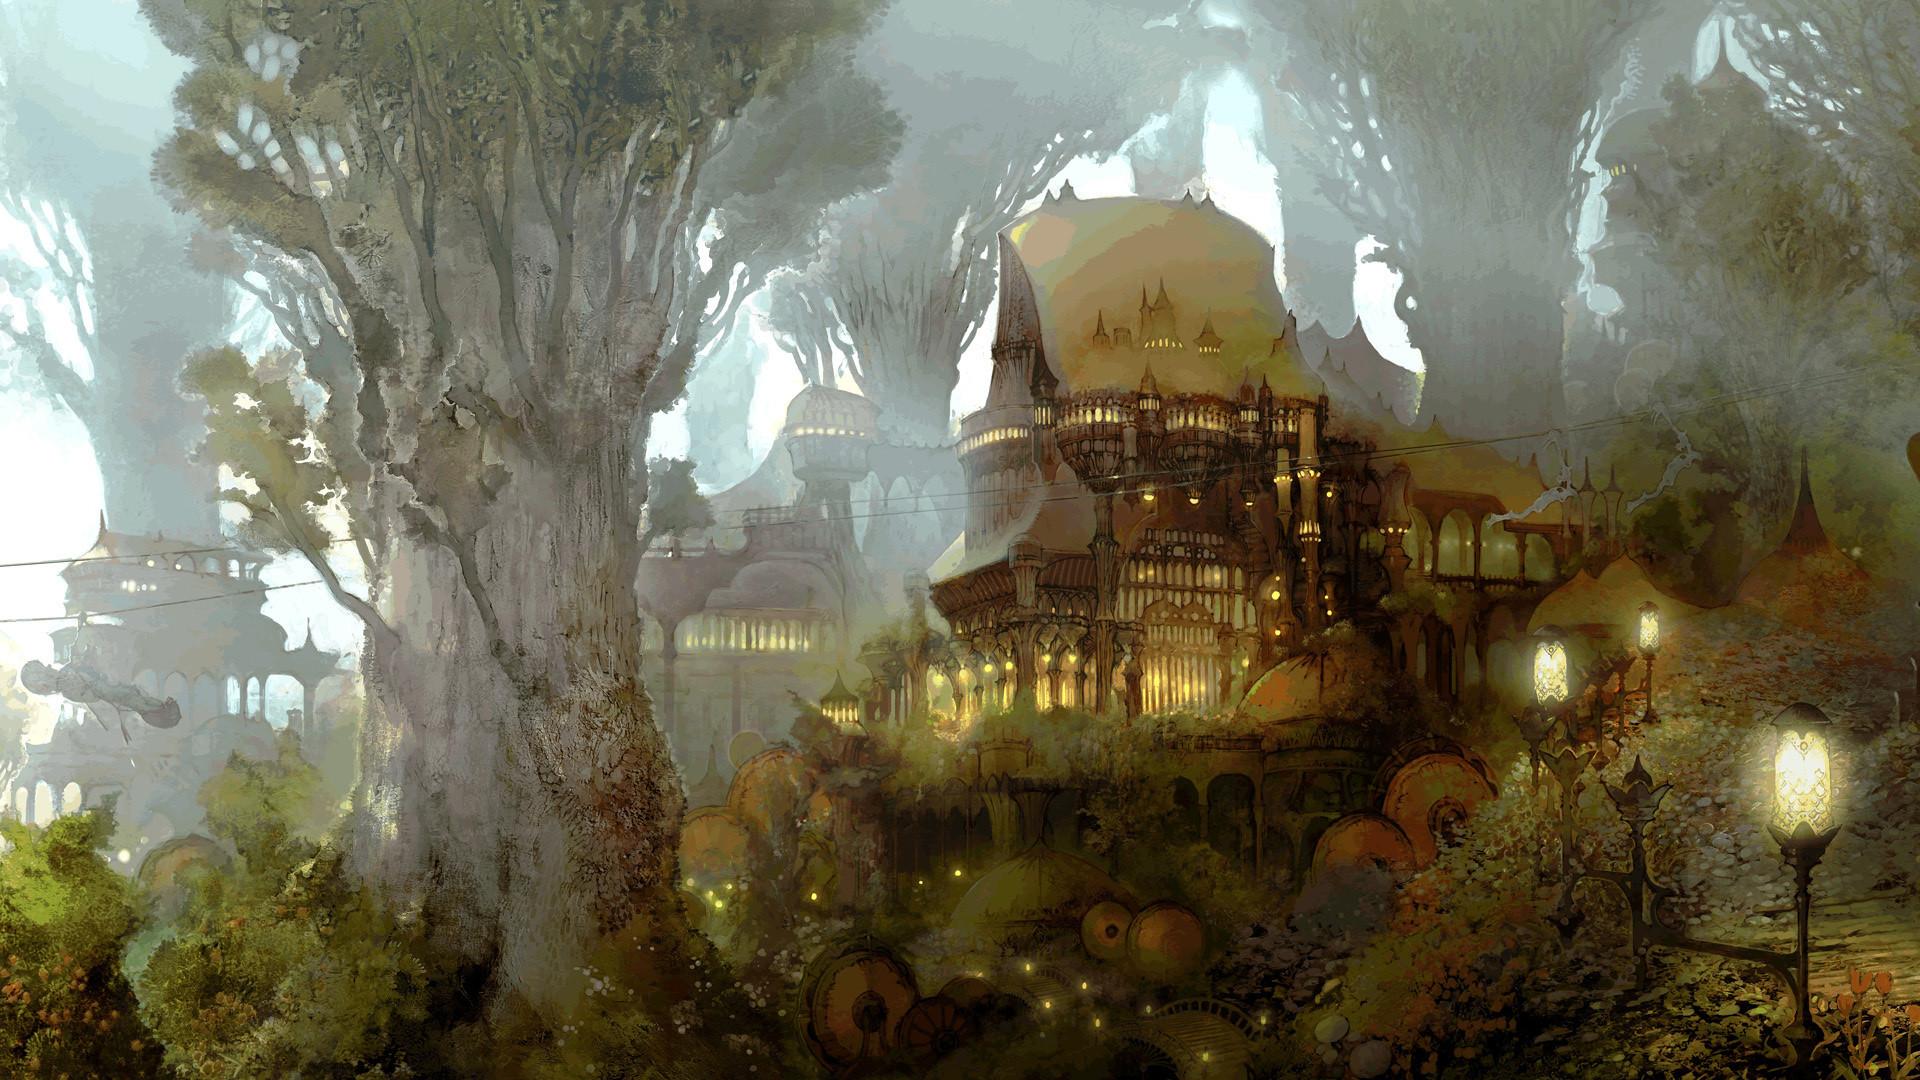 Dreamy & Fantasy Fantasy Desktop wallpapers (Desktop, Phone, Tablet ...